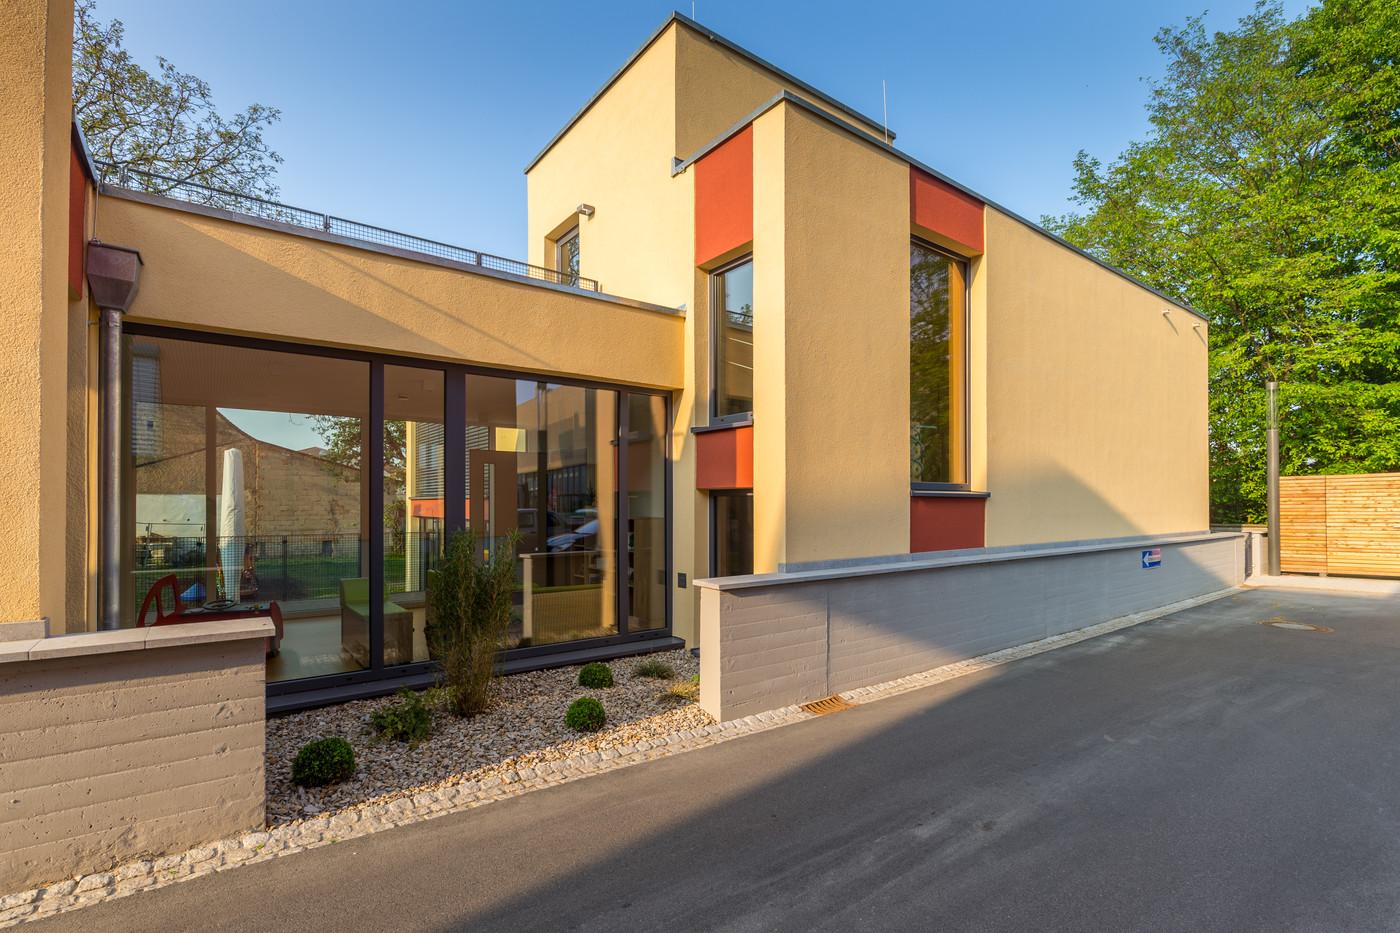 Das AWO-Kinderhaus, Bamberger Straße.